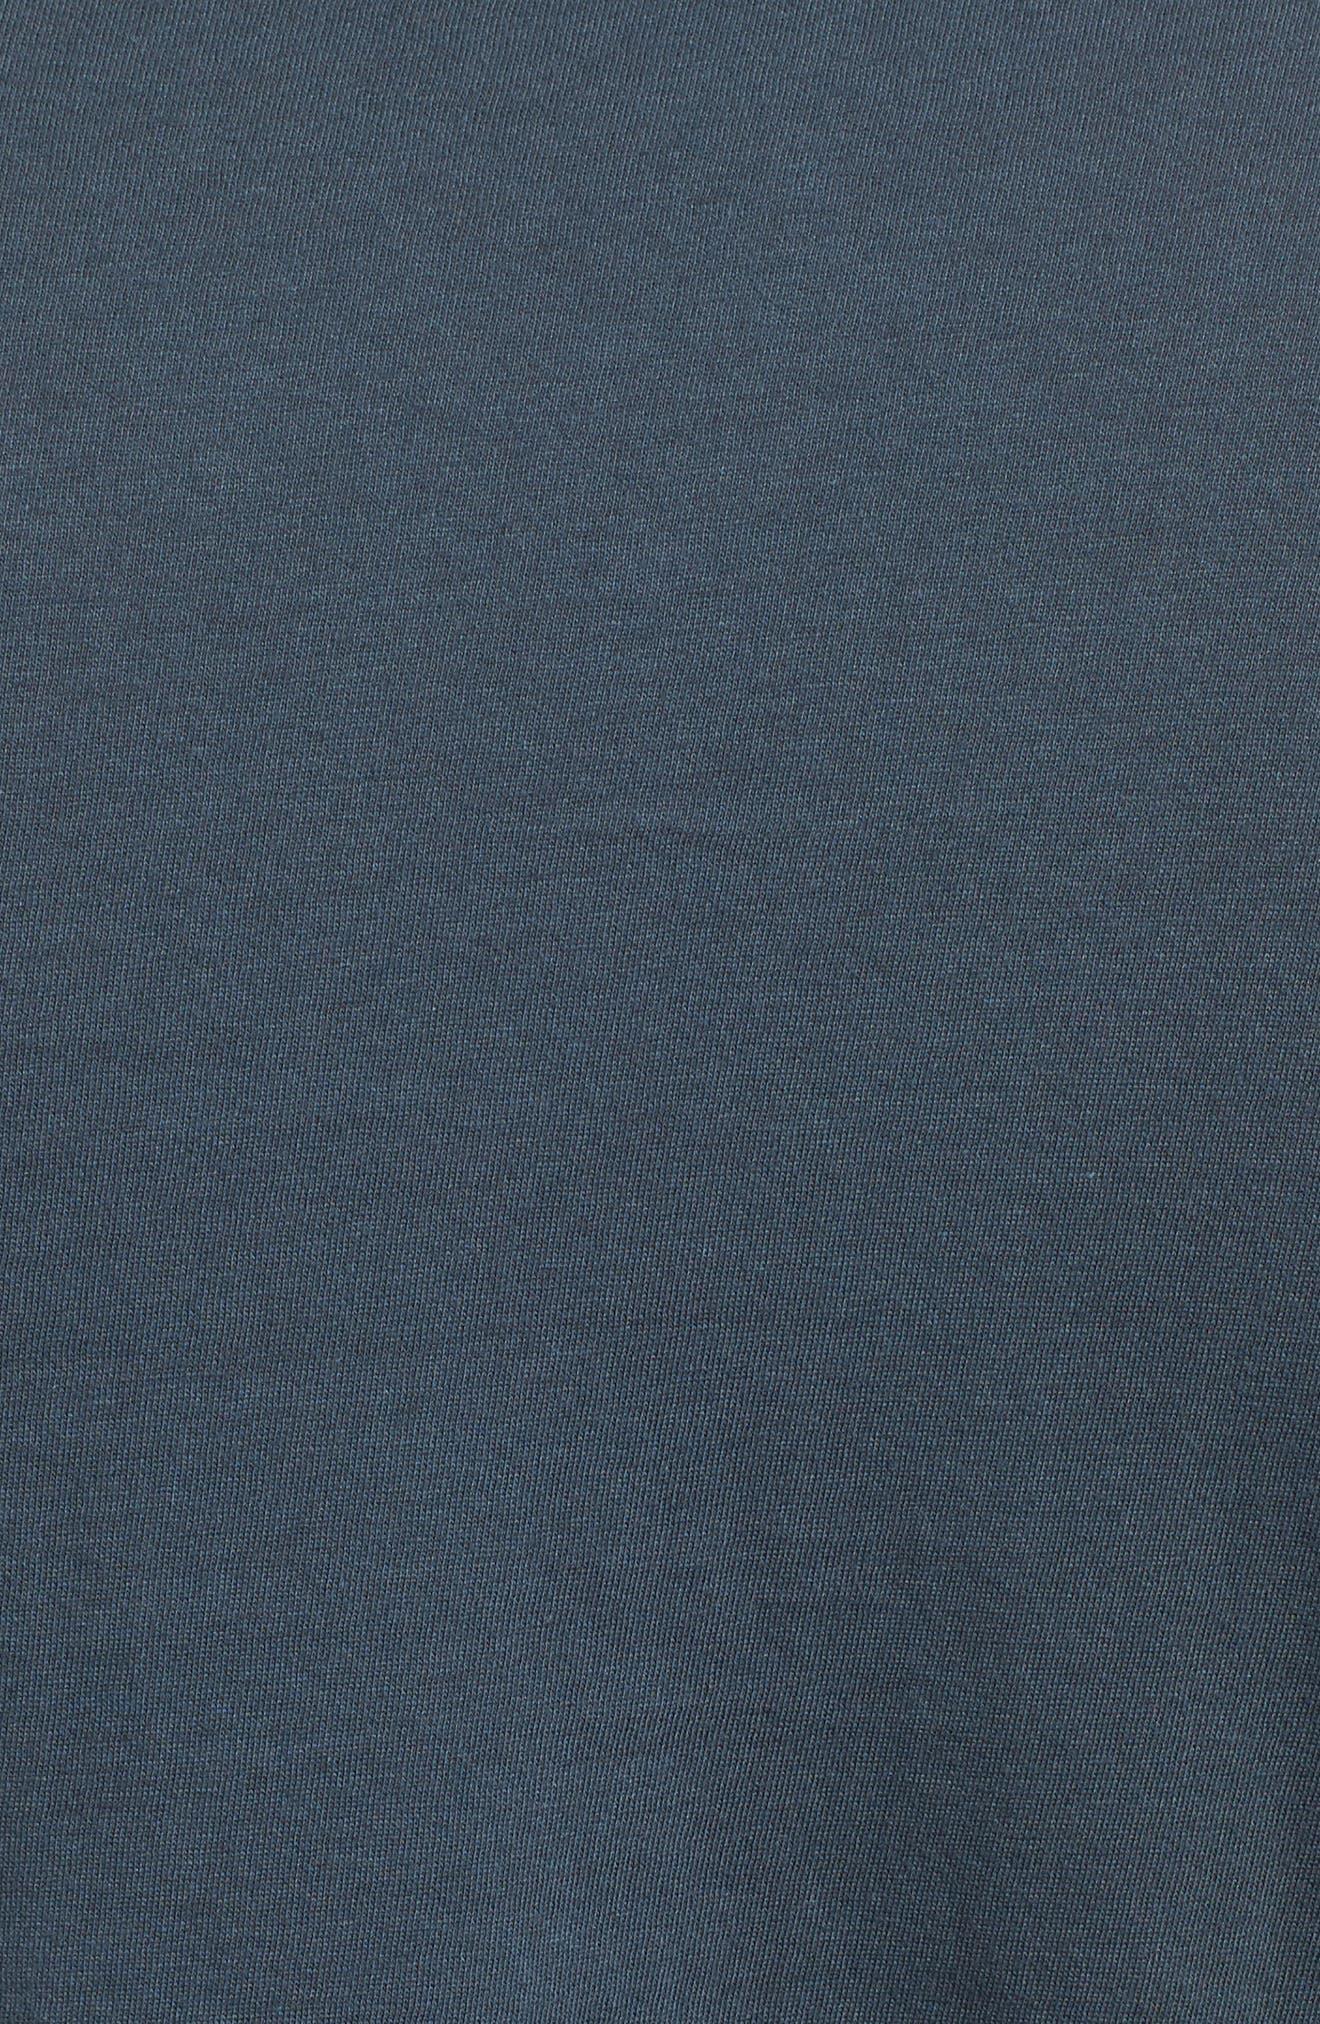 Big Palm Graphic T-Shirt,                             Alternate thumbnail 5, color,                             Midnight